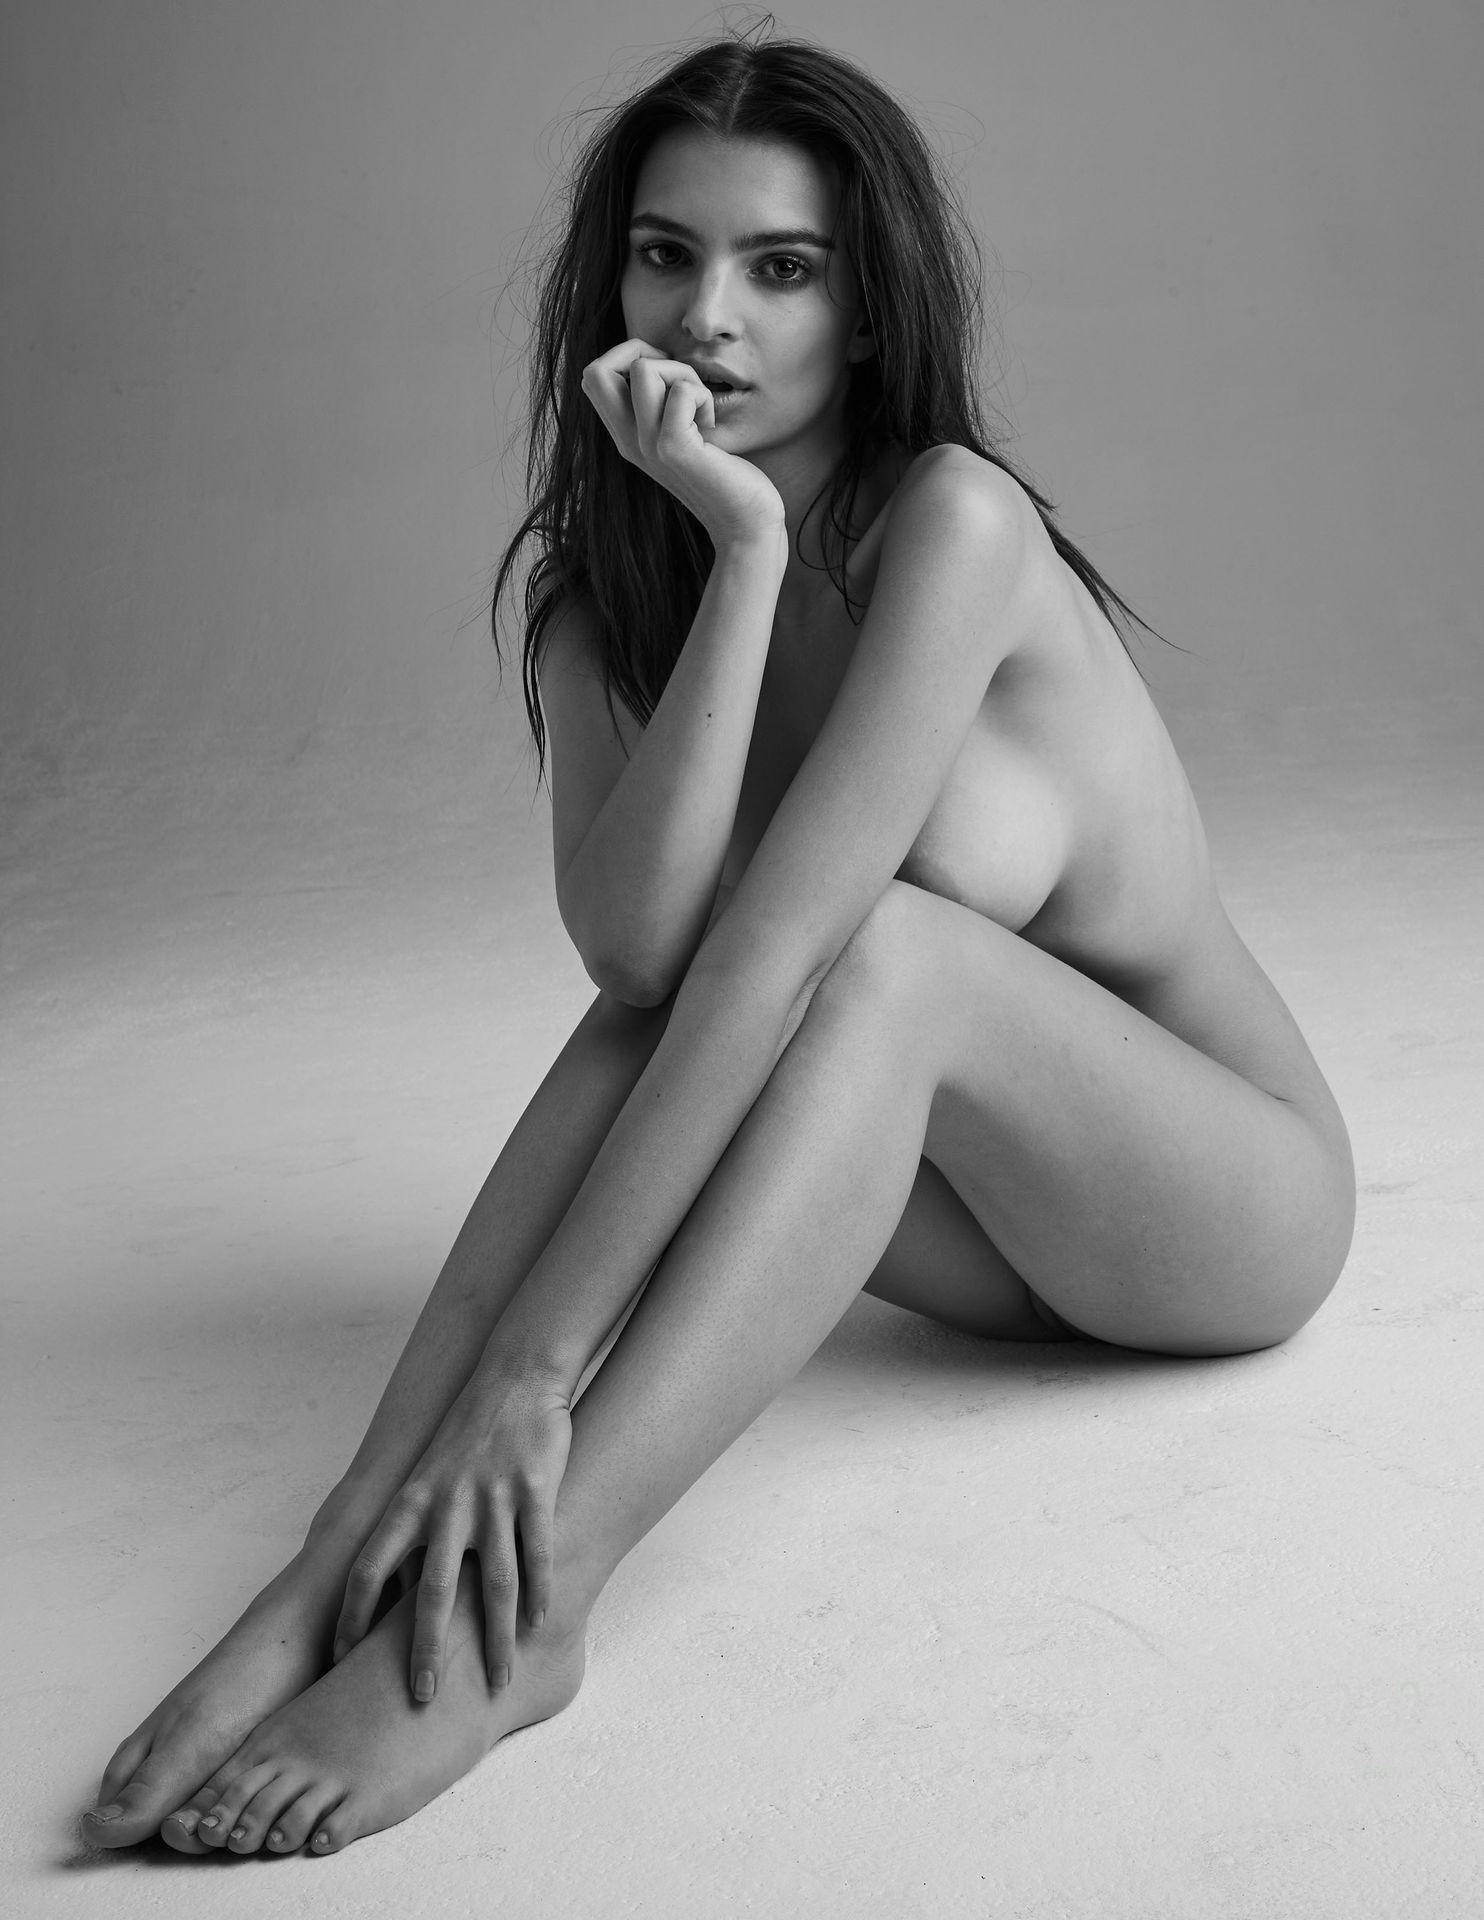 2Emily-Ratajkowski-Nude-24-thefappeningblog.com_.jpg